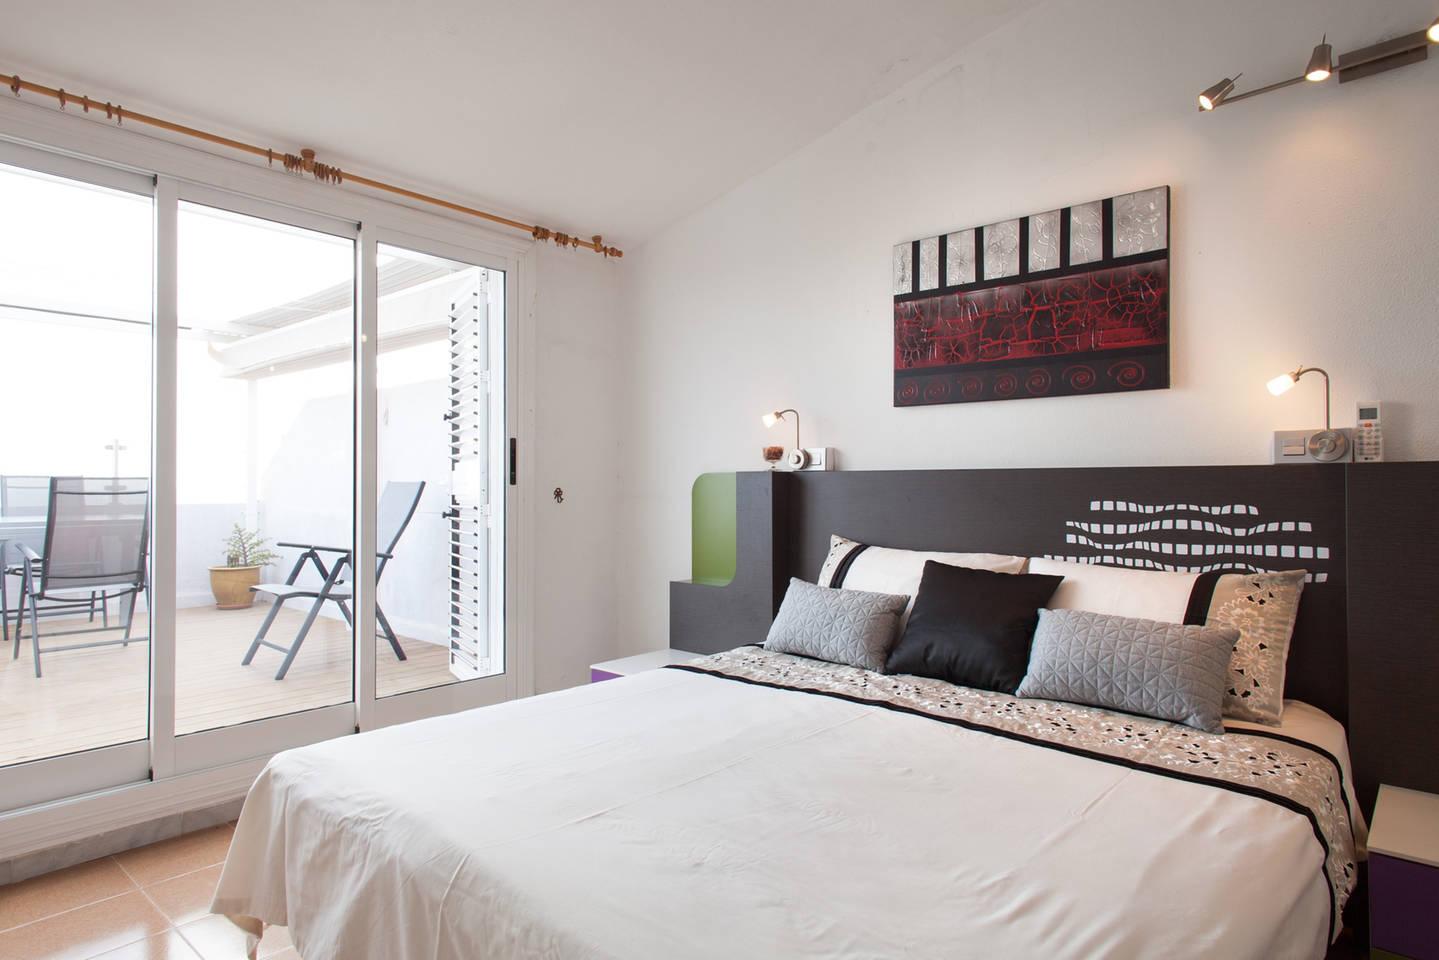 Appartement de vacances apartment in La Mata Costa Blanca (2187577), Torrevieja, Costa Blanca, Valence, Espagne, image 27